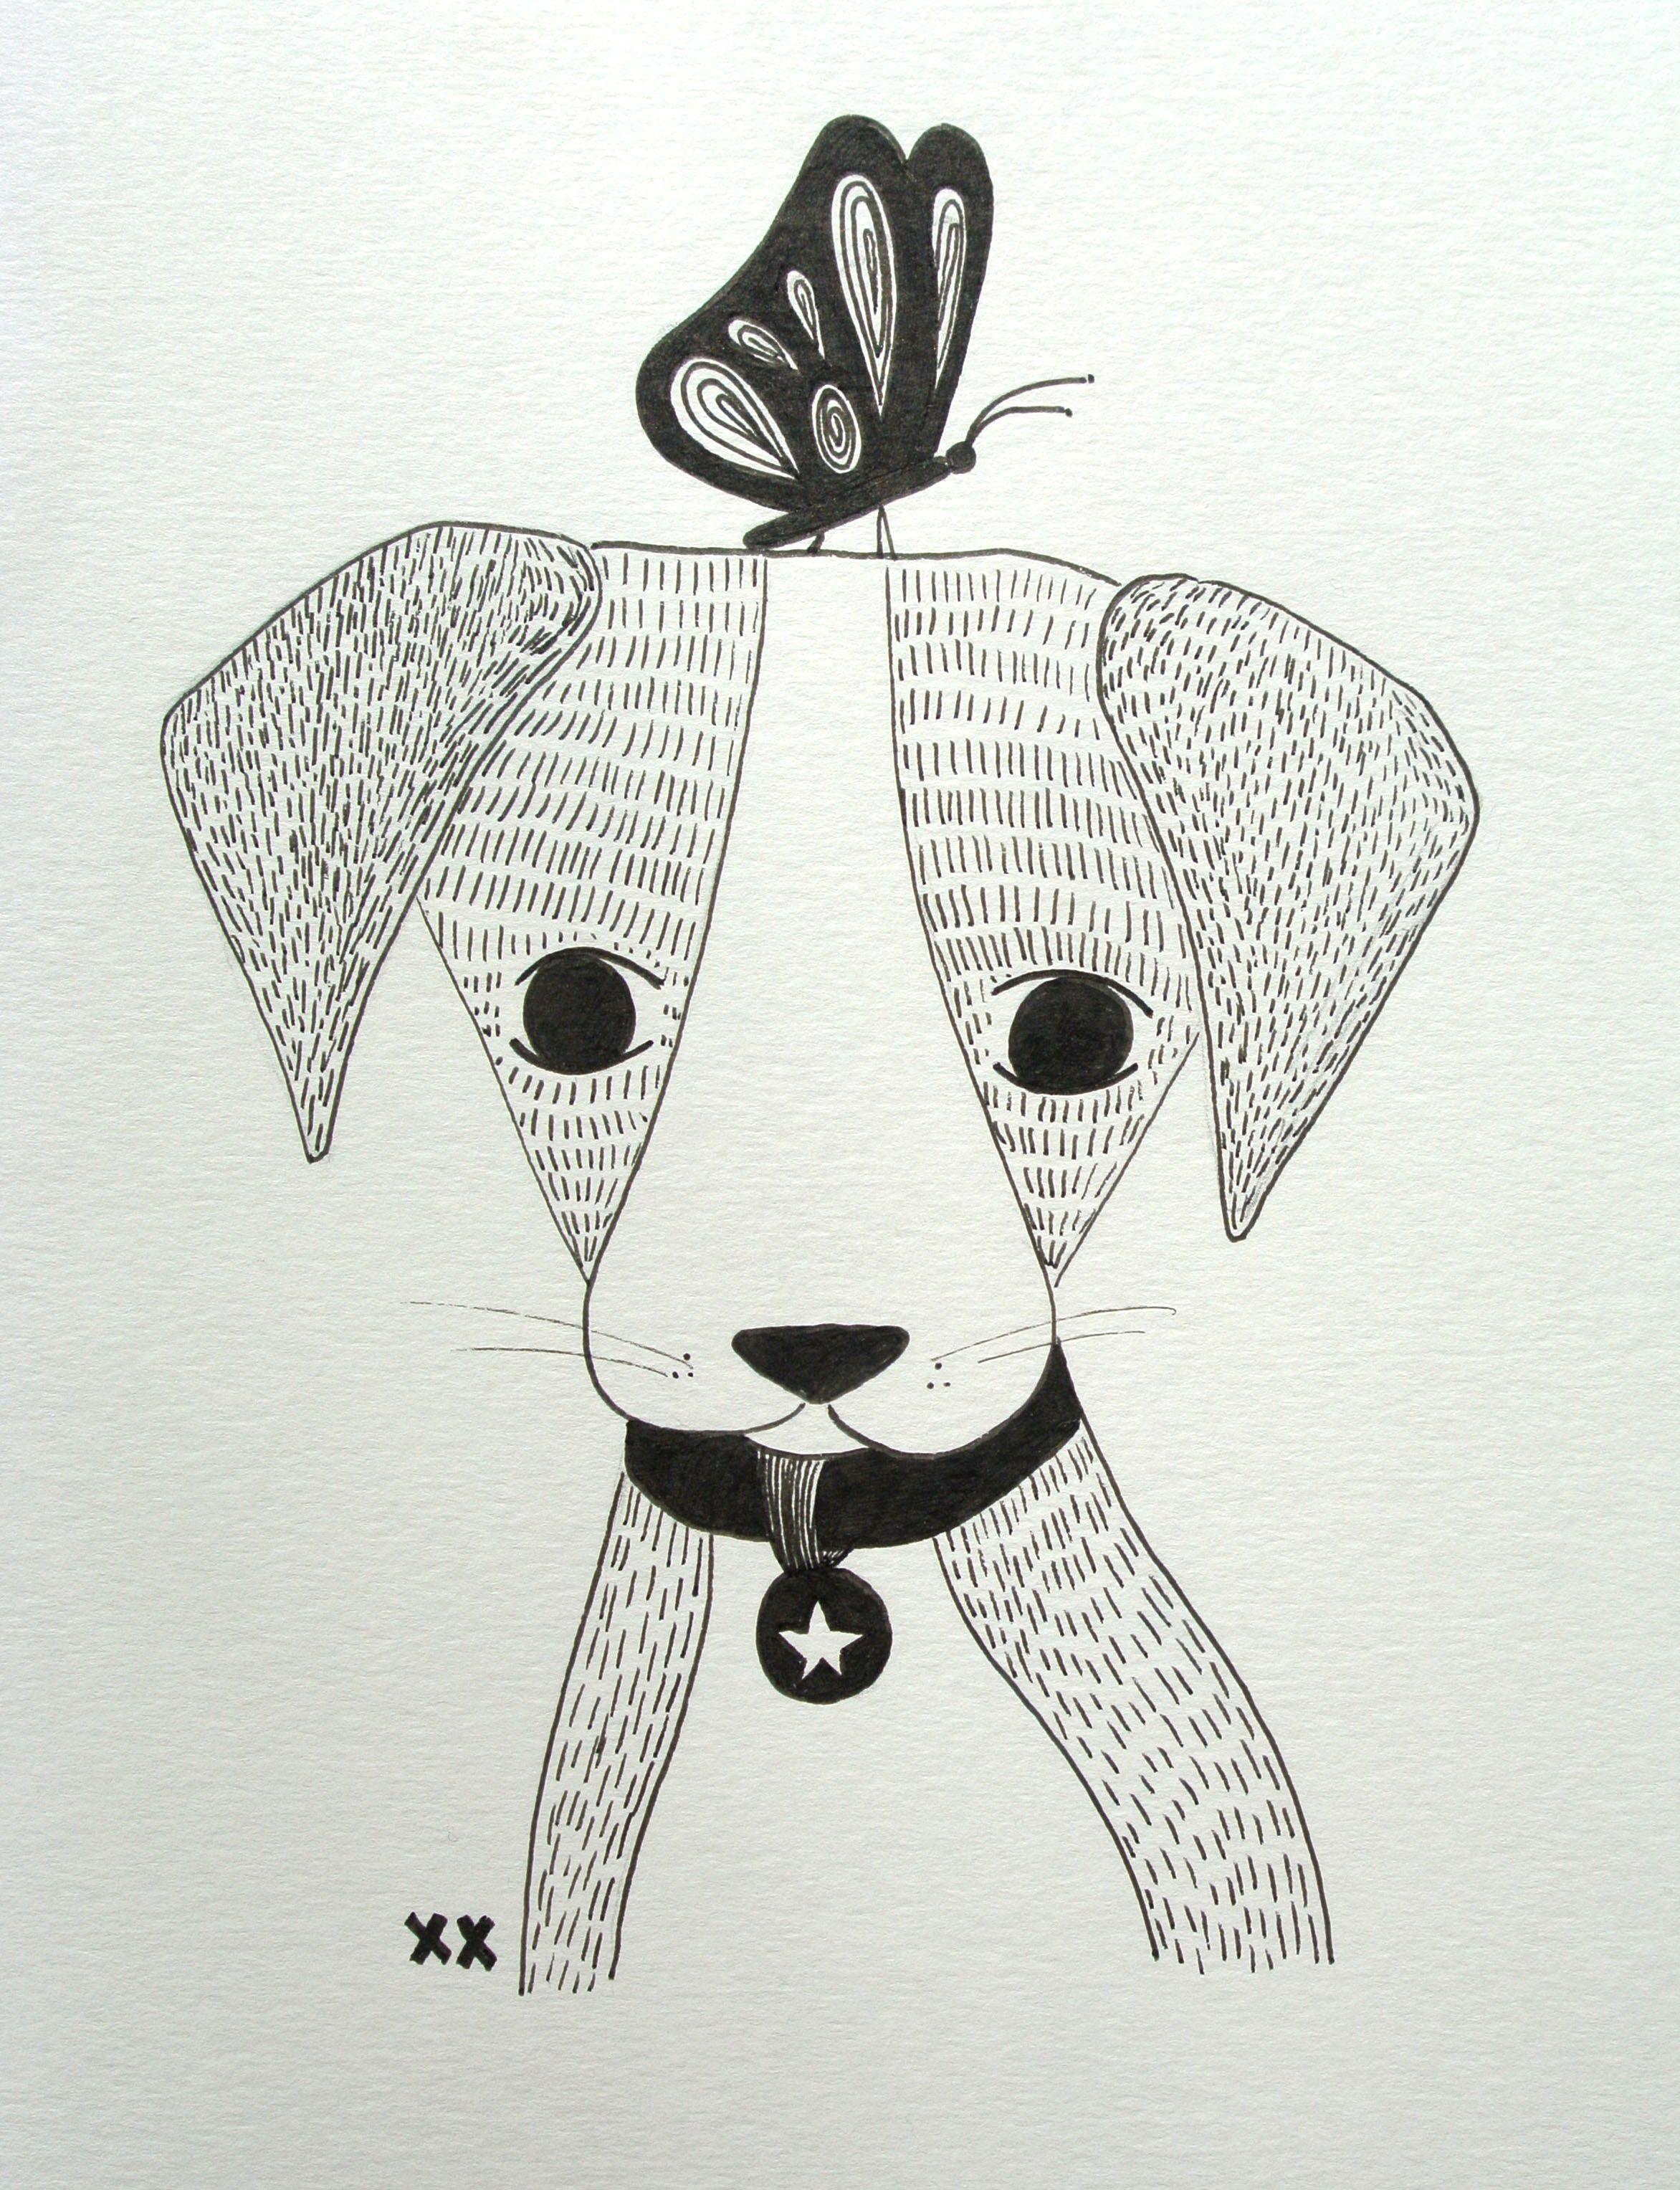 Dog Illustration Hondje Illustratie Kidsroom Www Kinderkamervintage Nl Dieren Tekenen Illustratie Kunst Design Illustraties